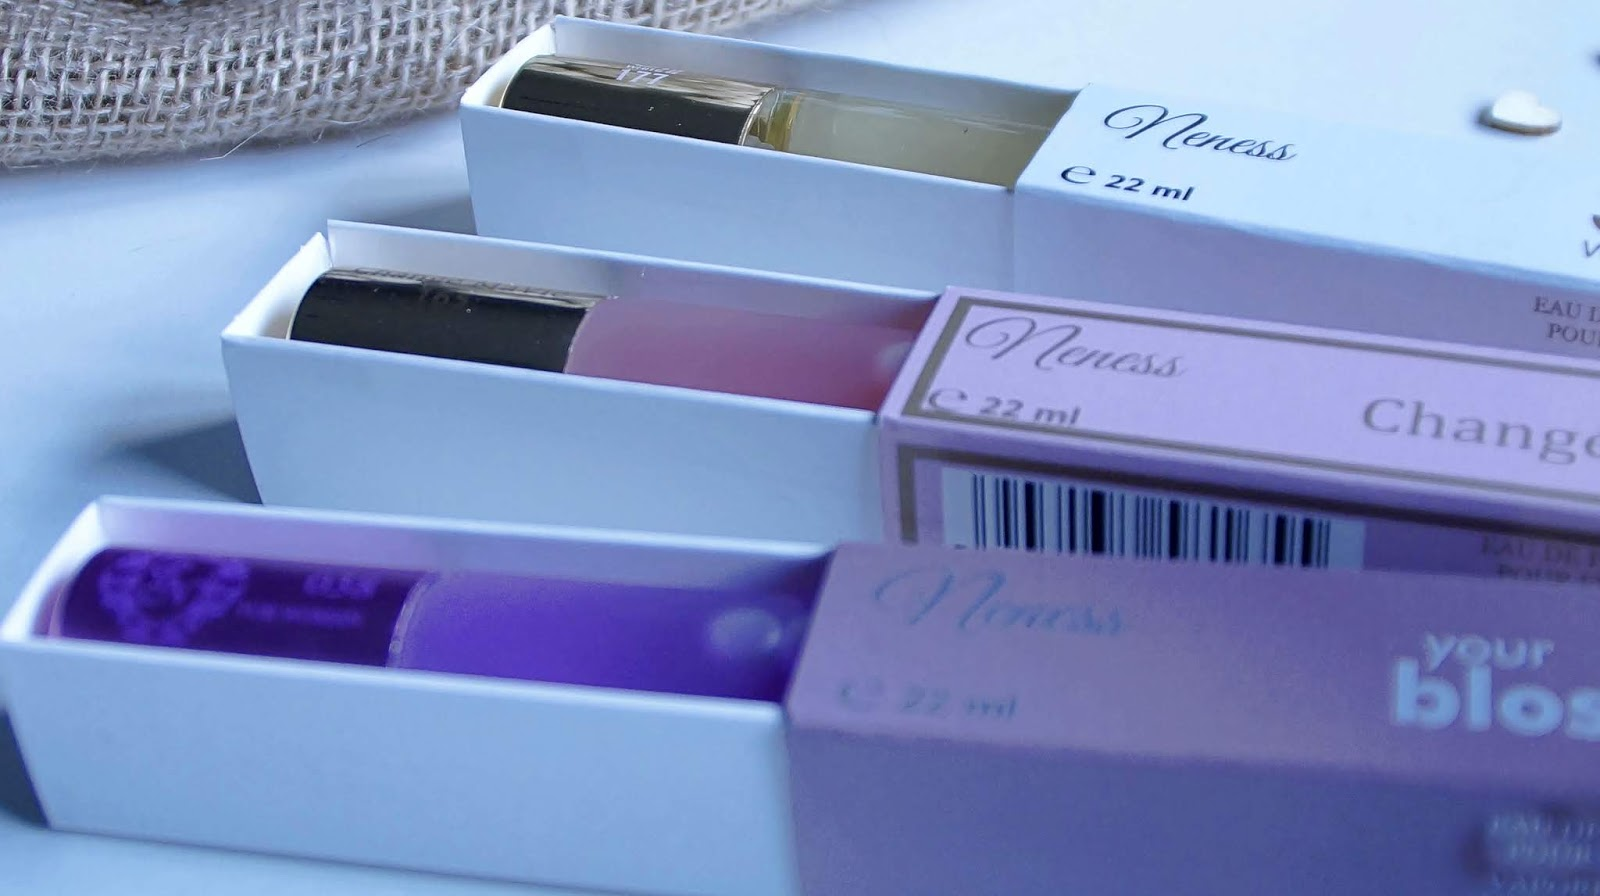 Perfumeria Neness